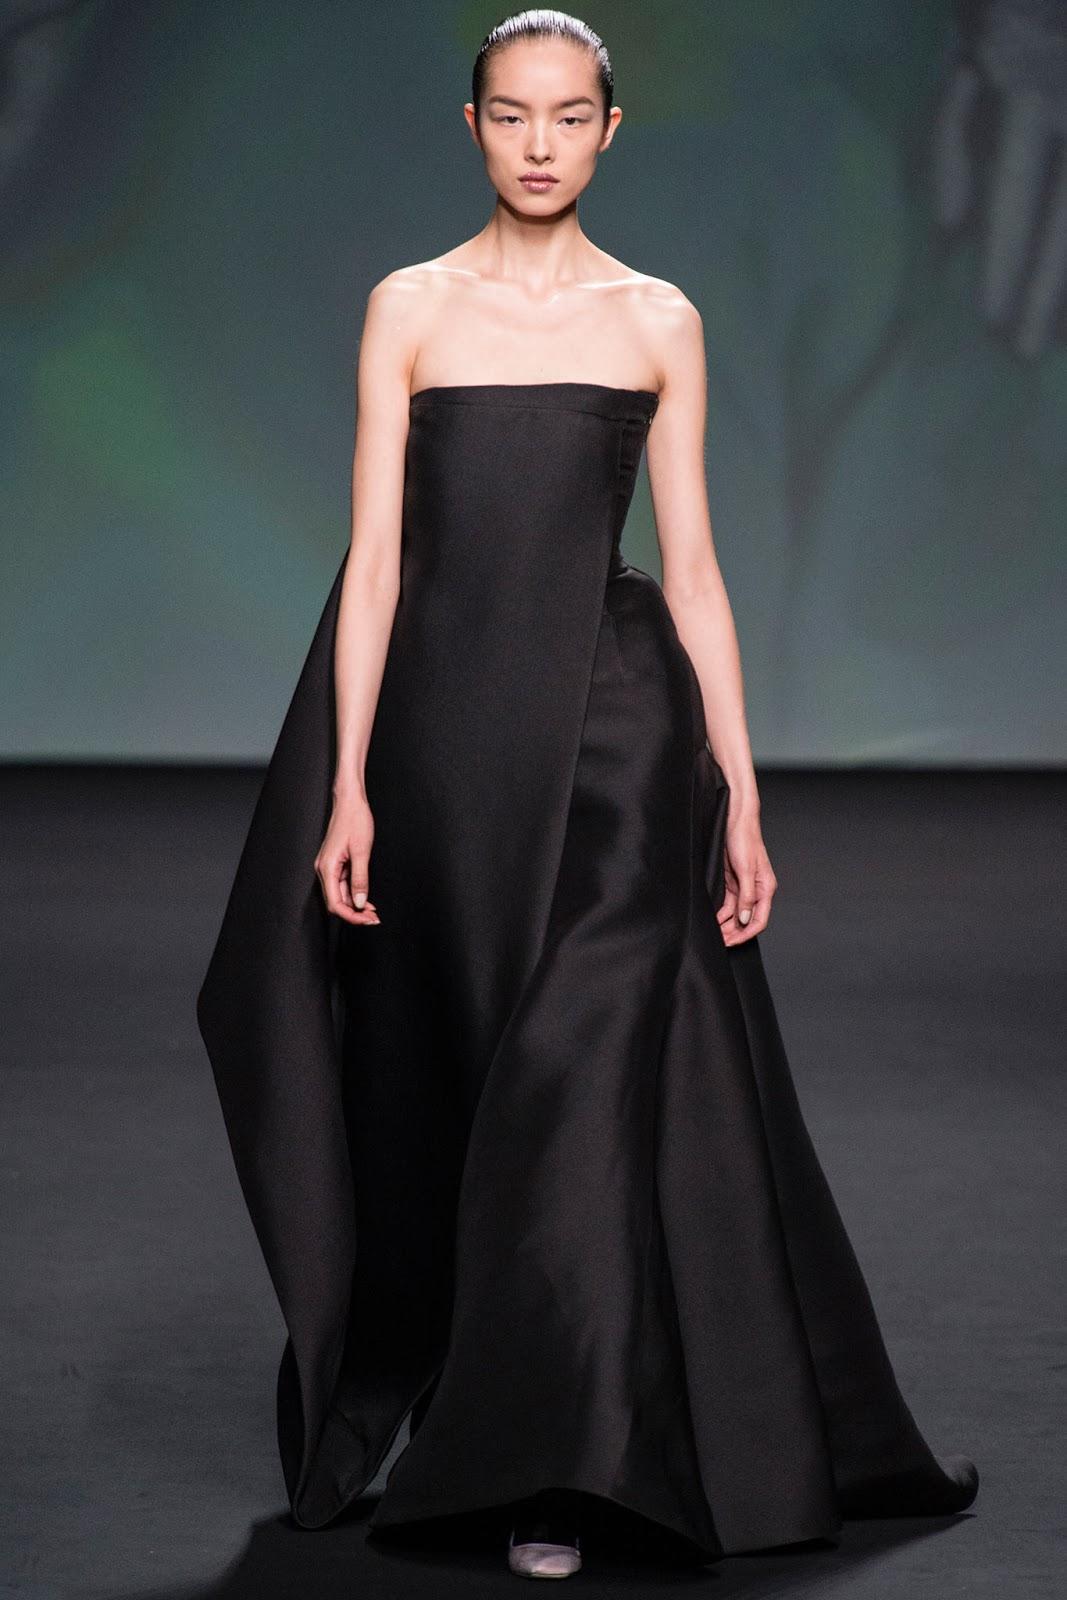 CHRISTIAN DIOR HAUTE COUTURE FALL WINTER 2014 (41)  Christian Dior Haute Couture 2014